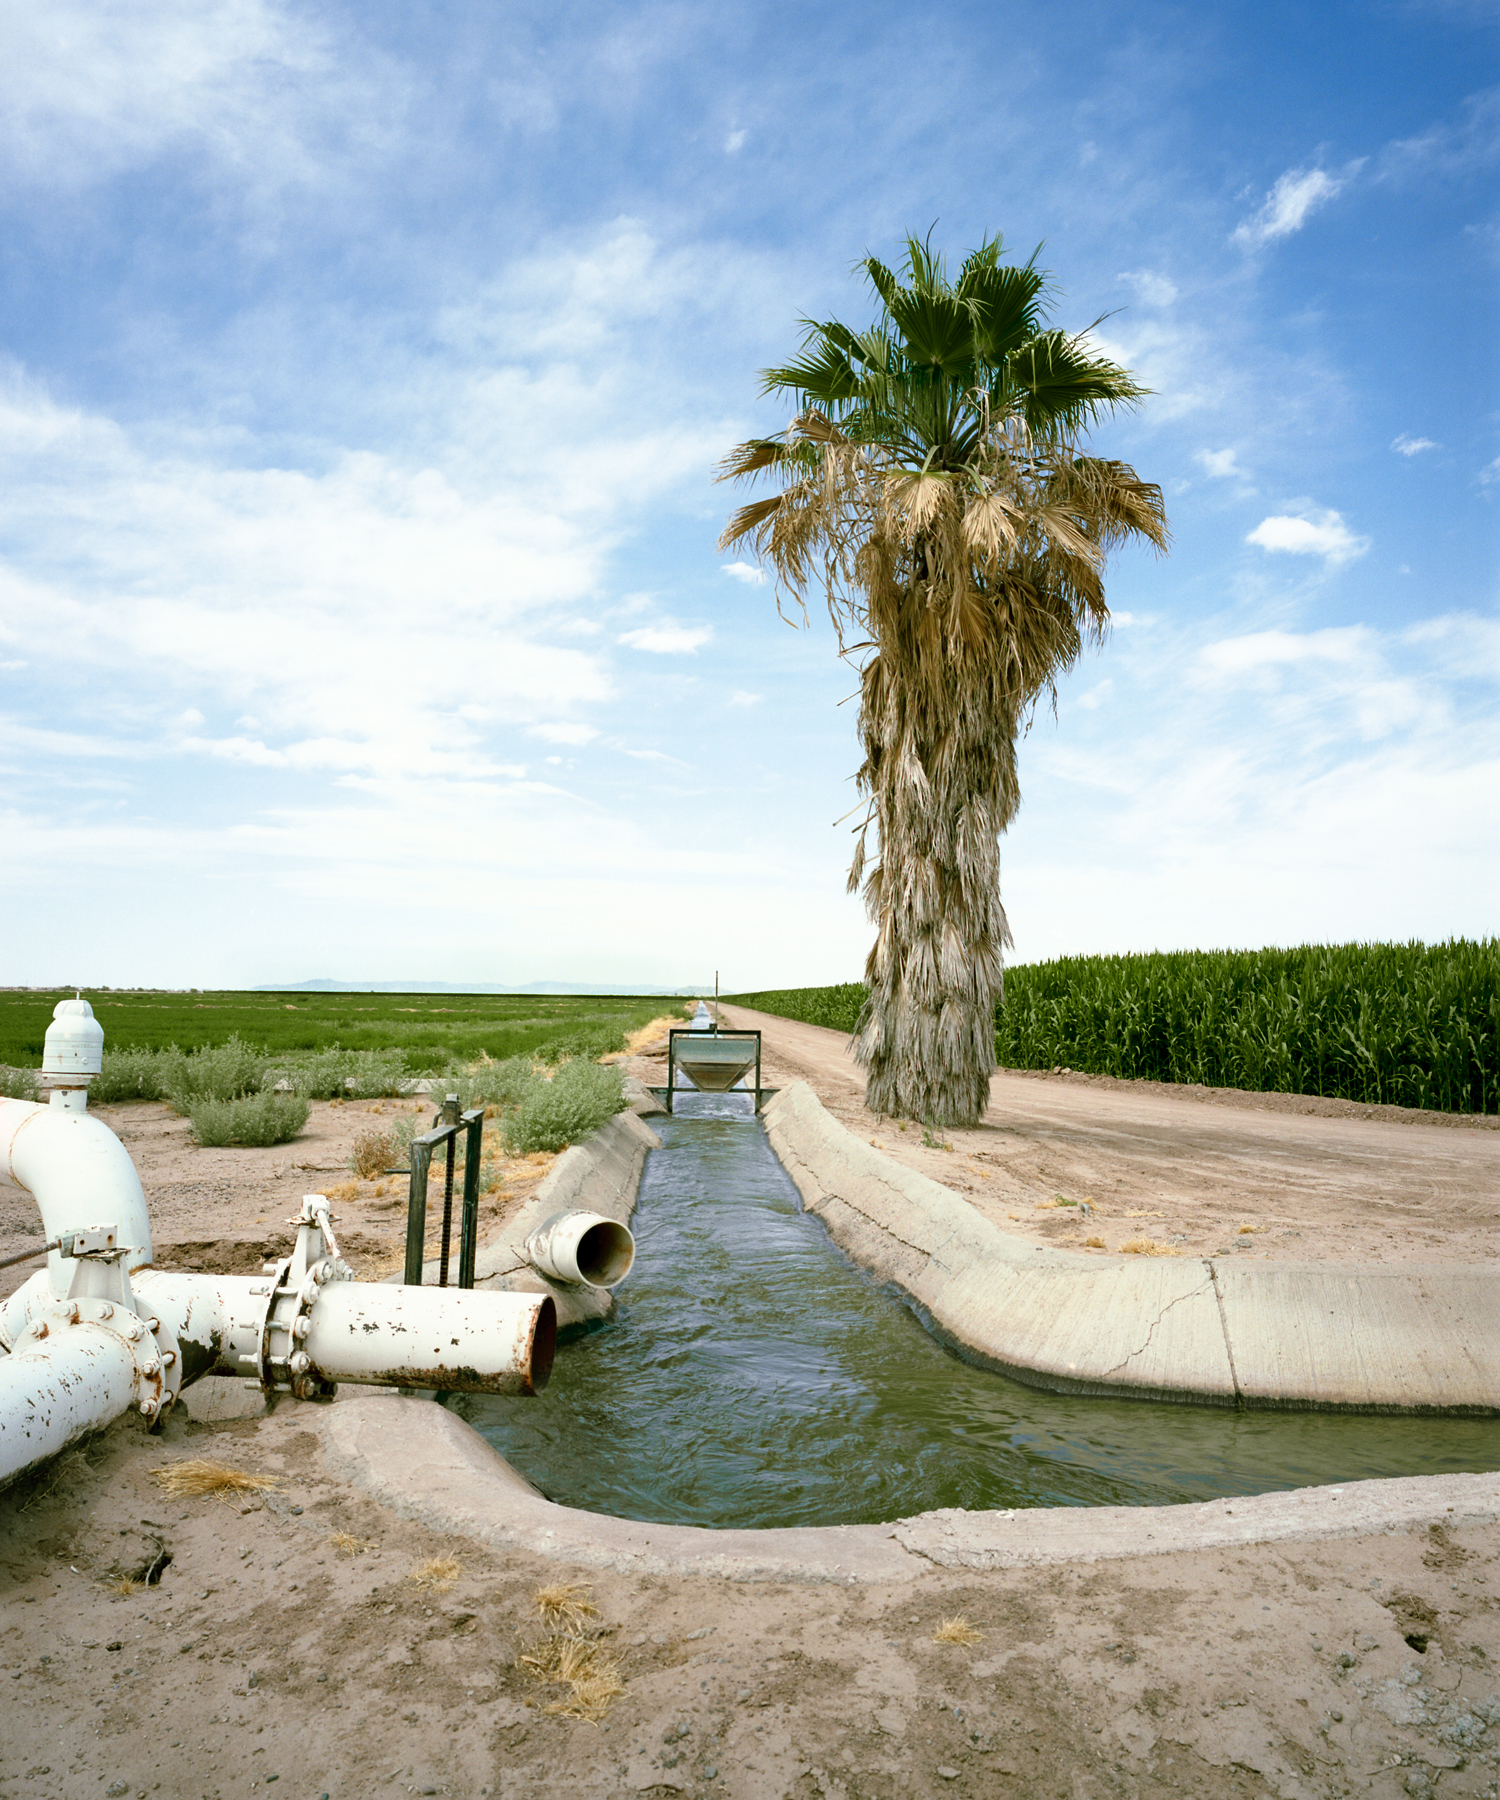 Ak Chin Farms I, Maricopa, AZ. 2013